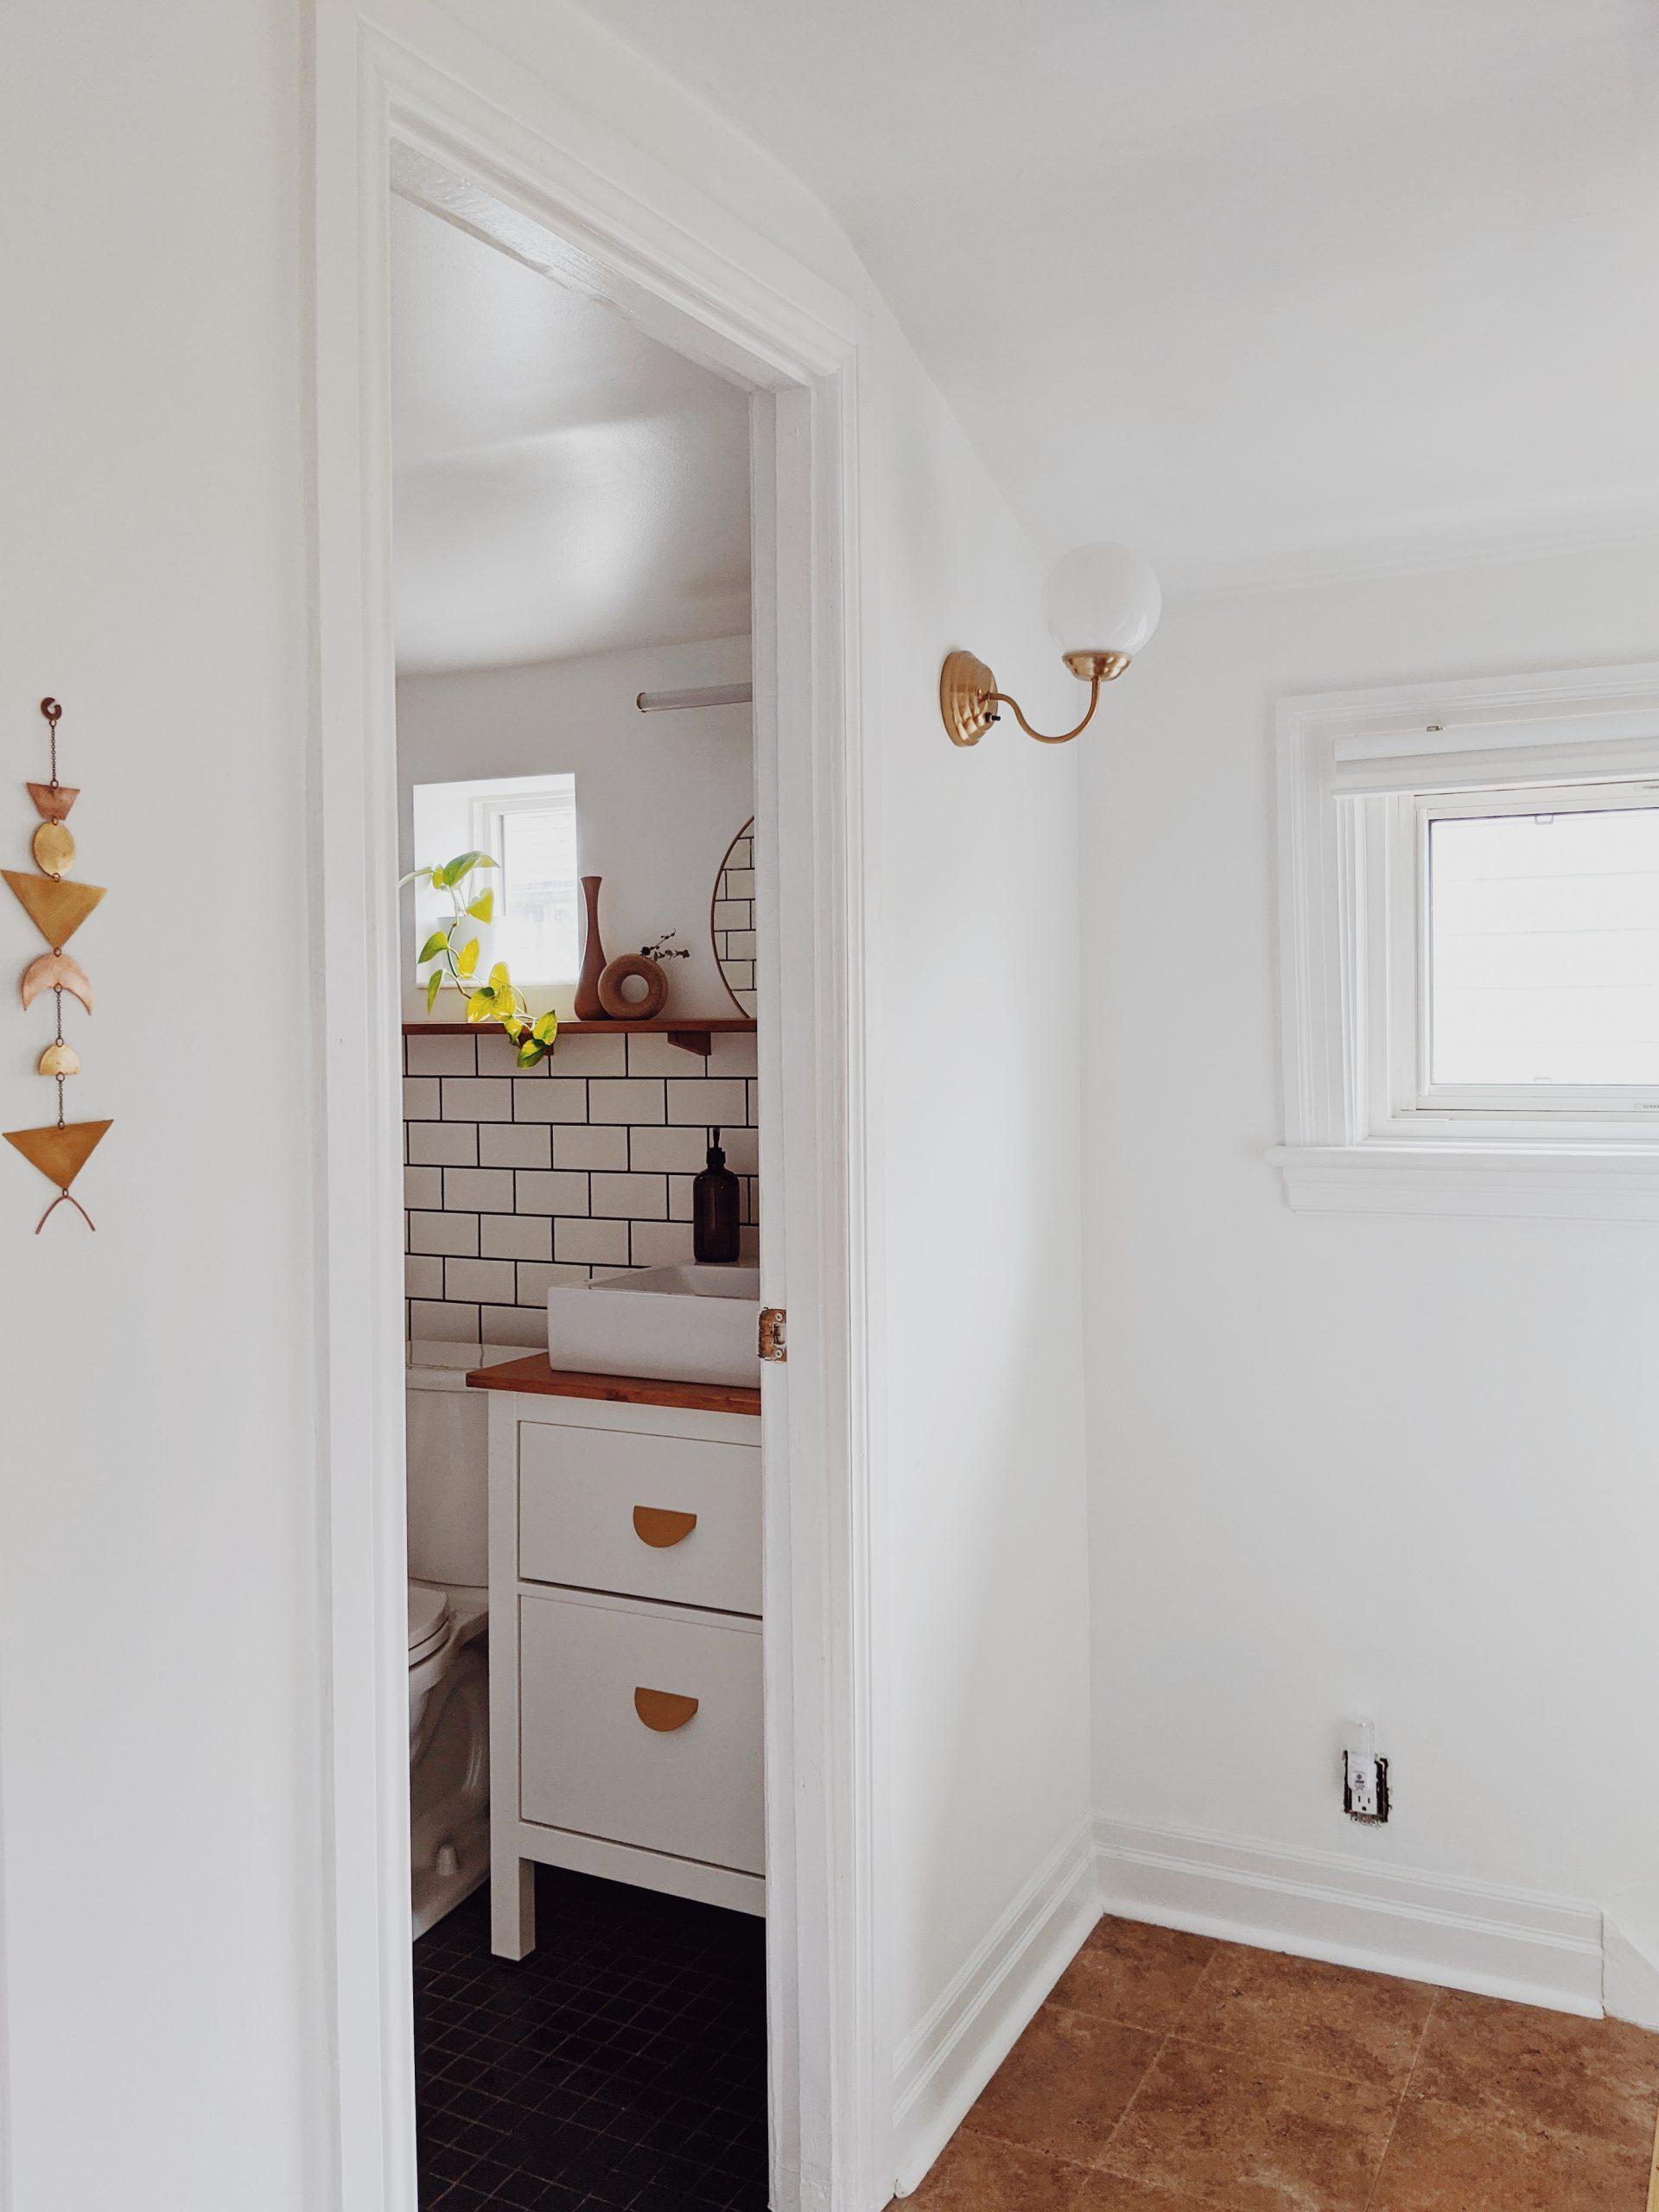 Main bathroom reno reveal